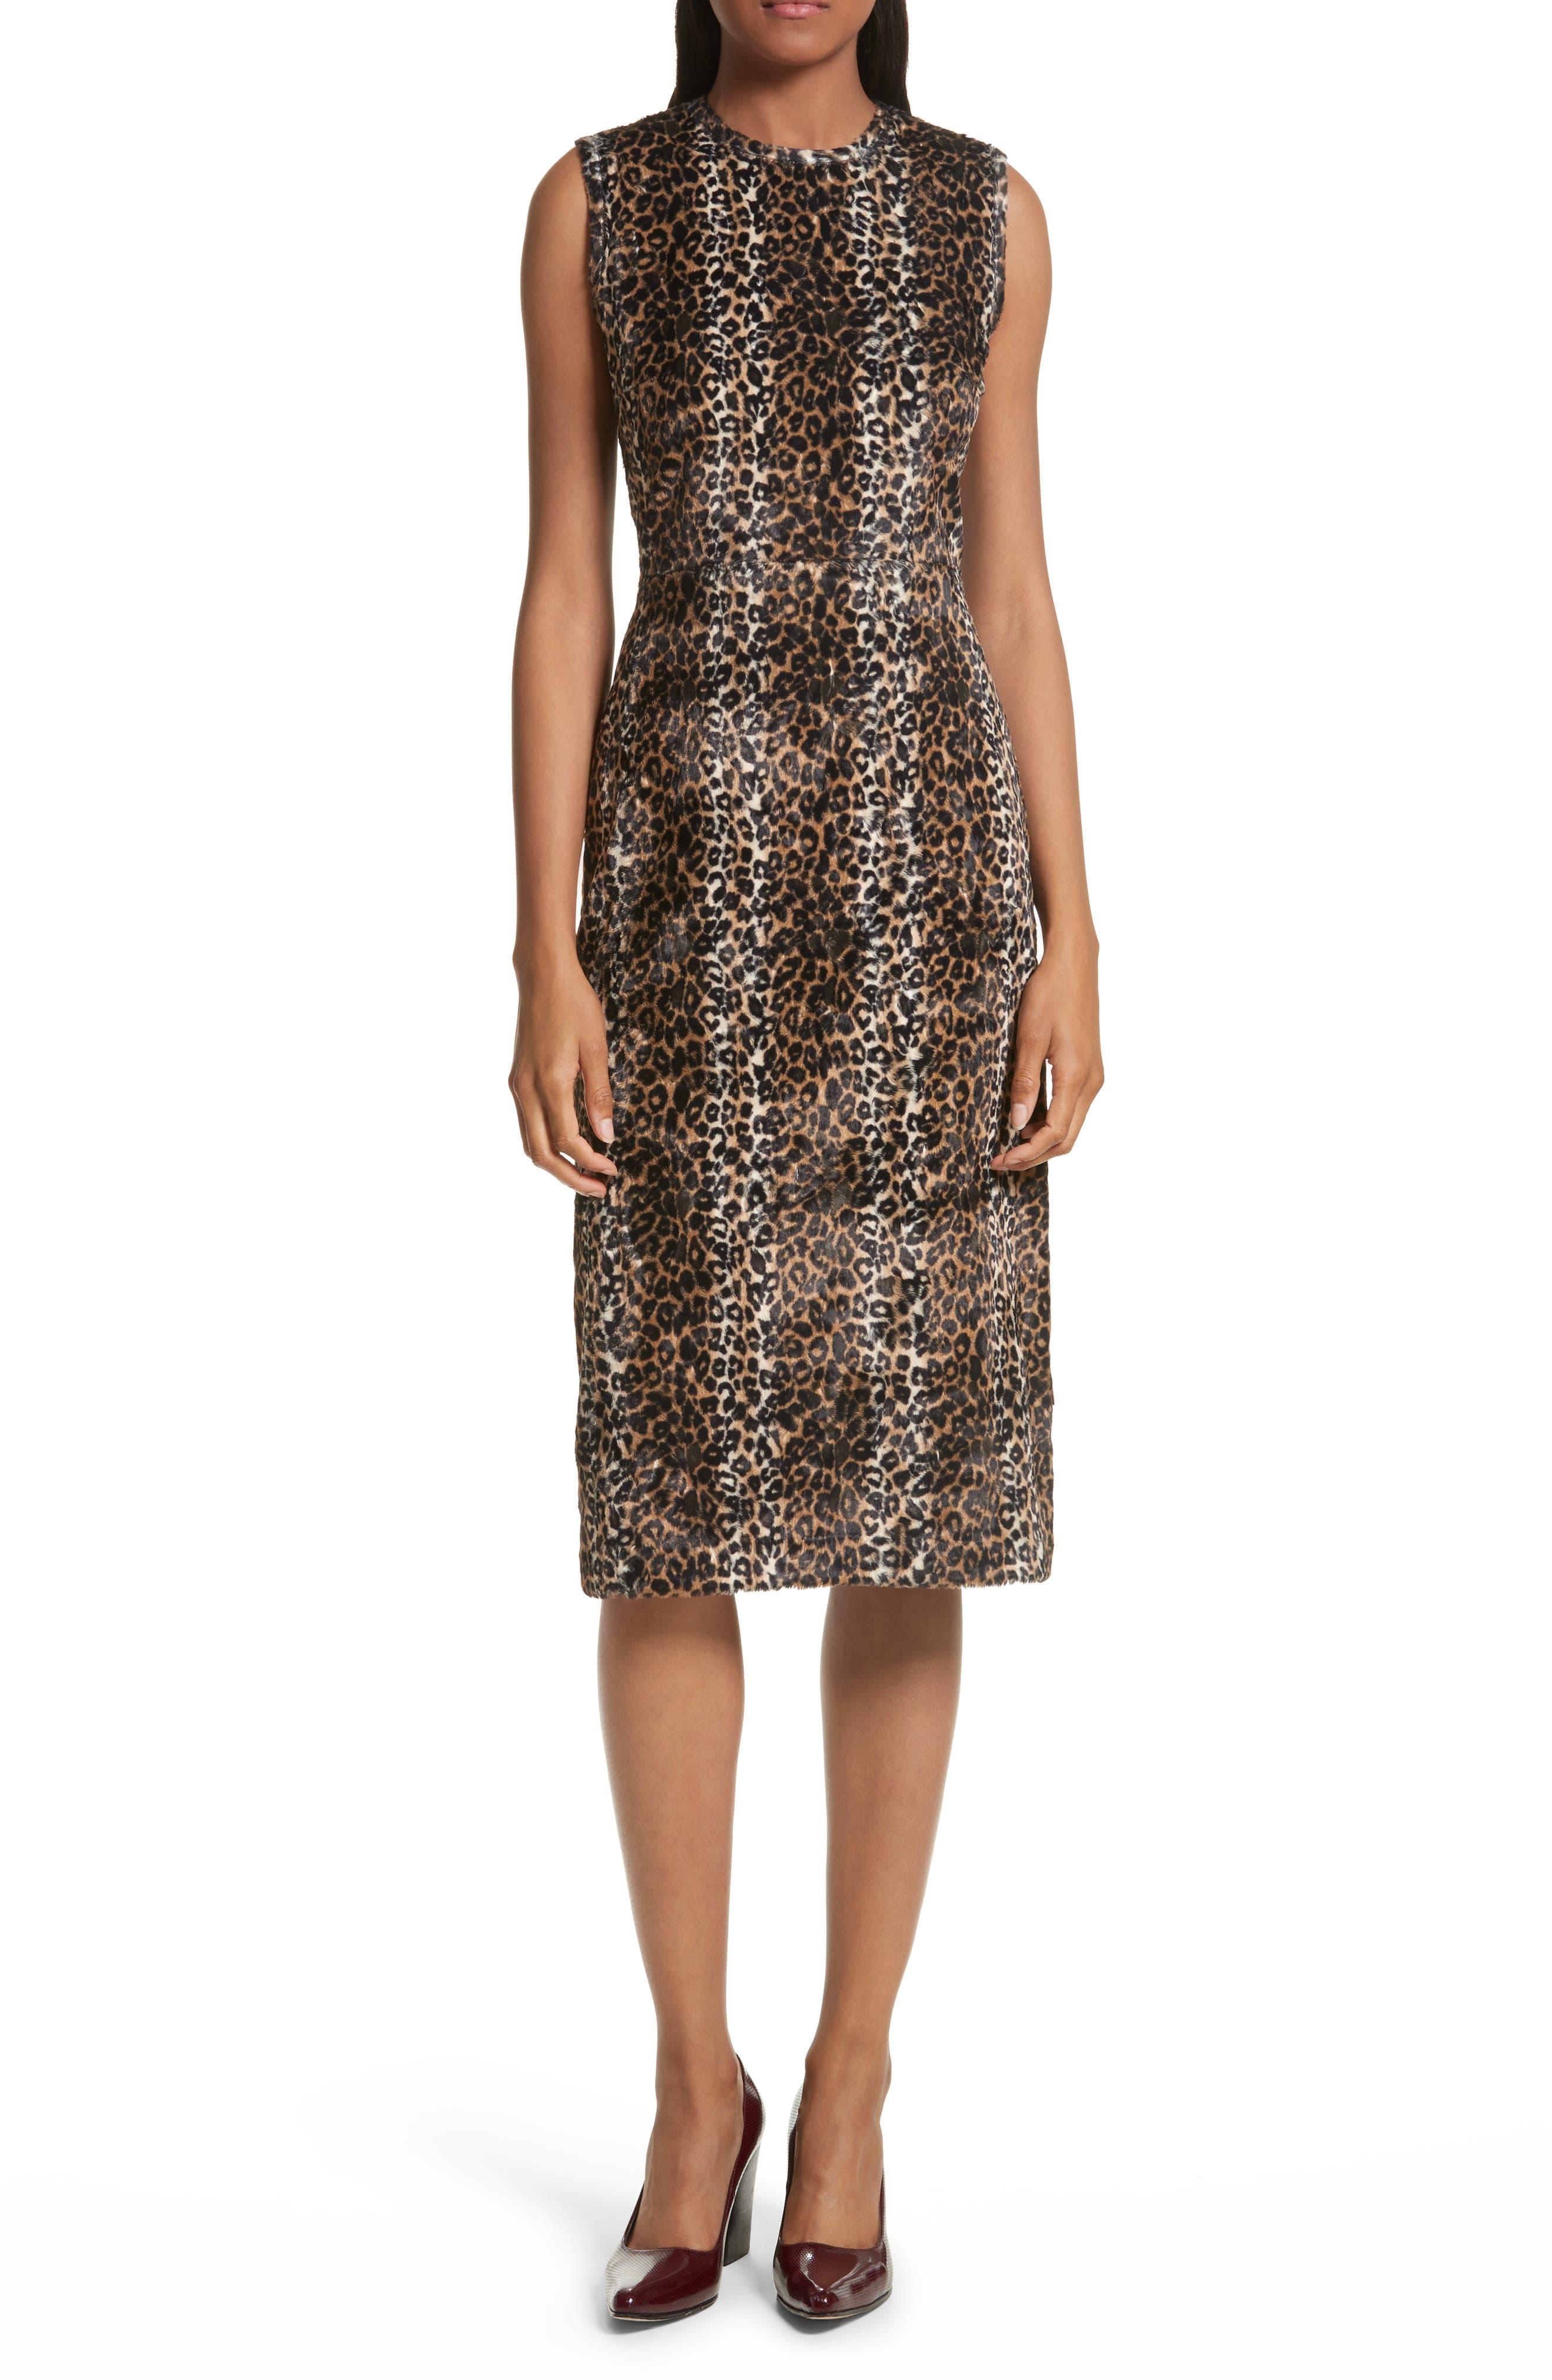 Main Image - Rachel Comey Sling Cheetah Faux Fur Sheath Dress